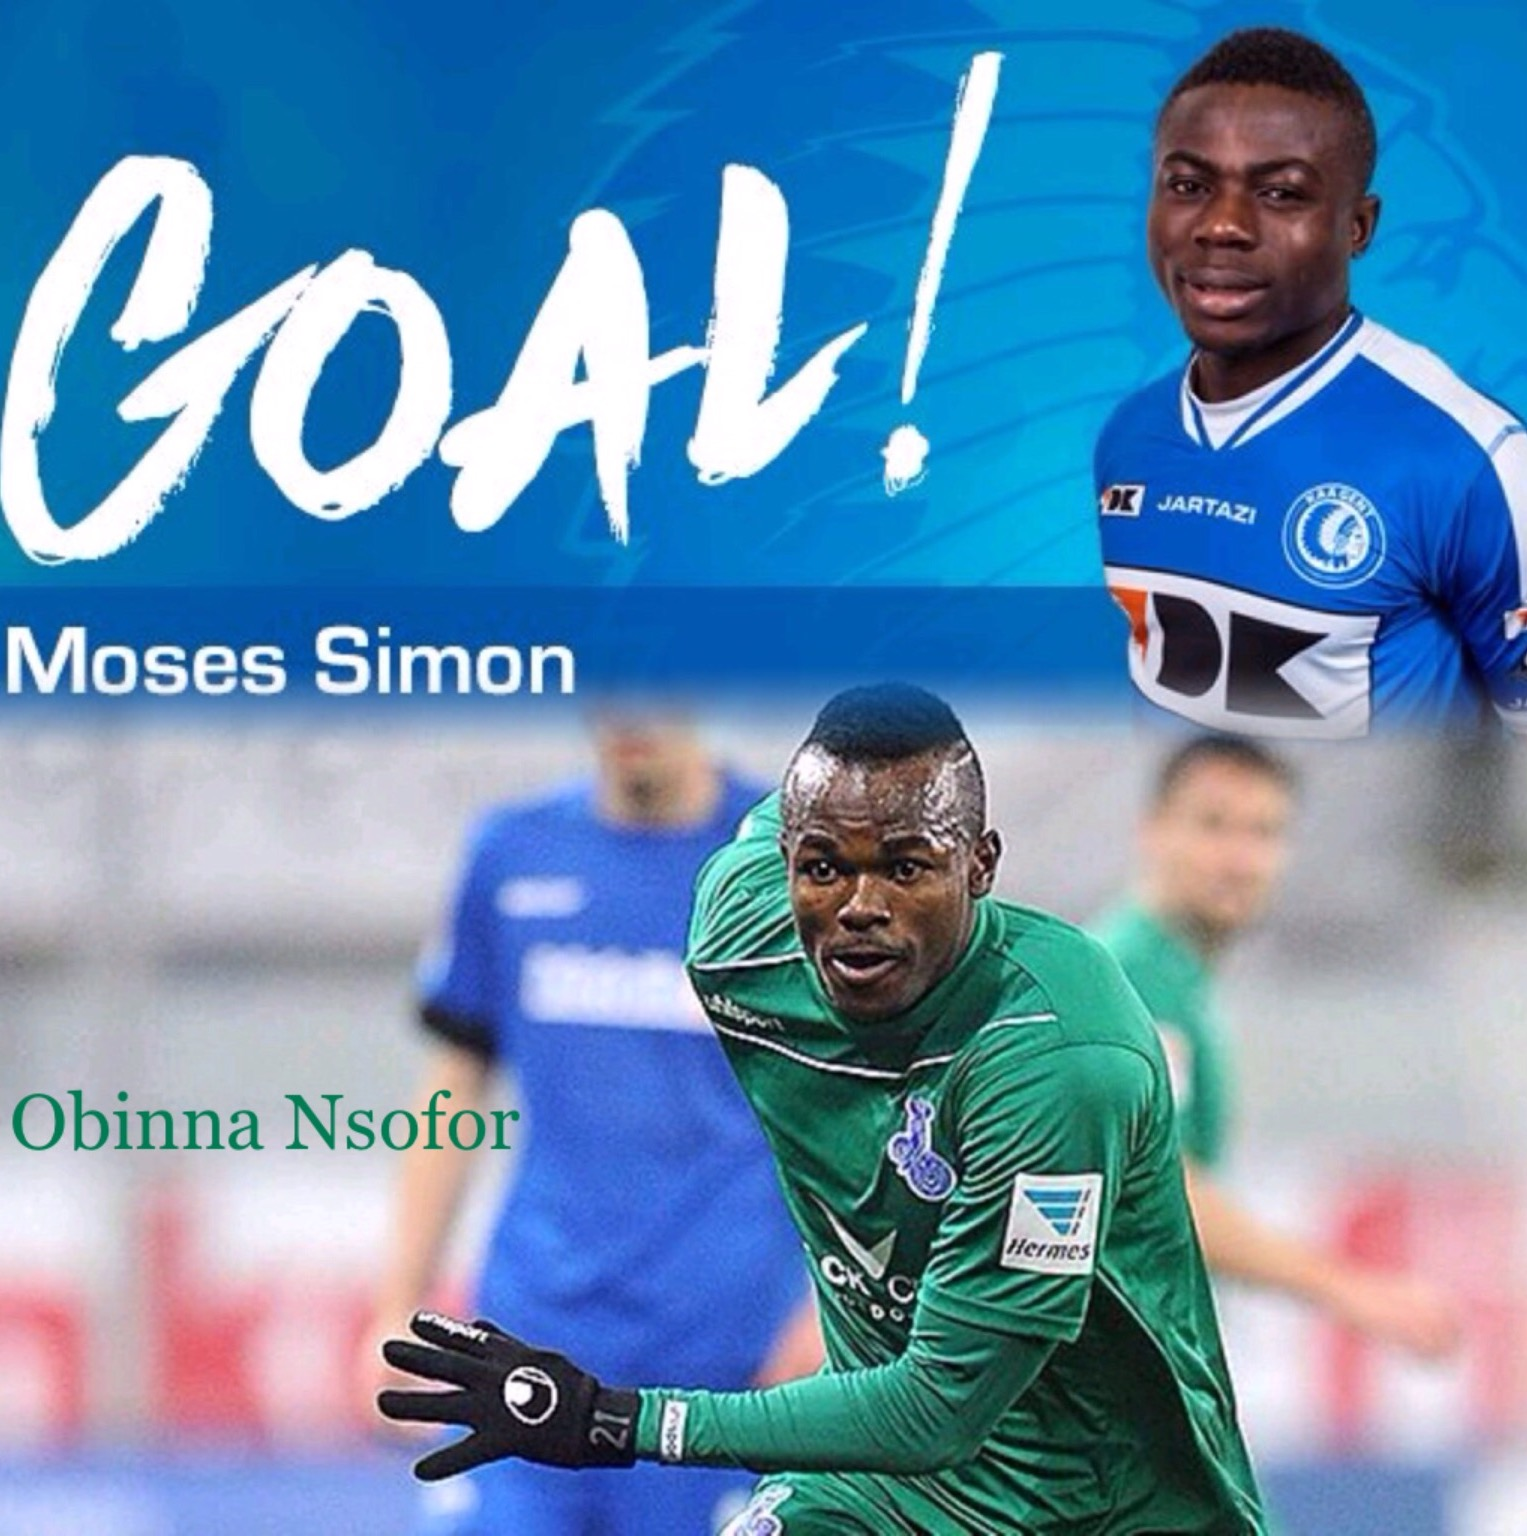 Simon, Nsofor on Target; Ikeme, Aluko In Action